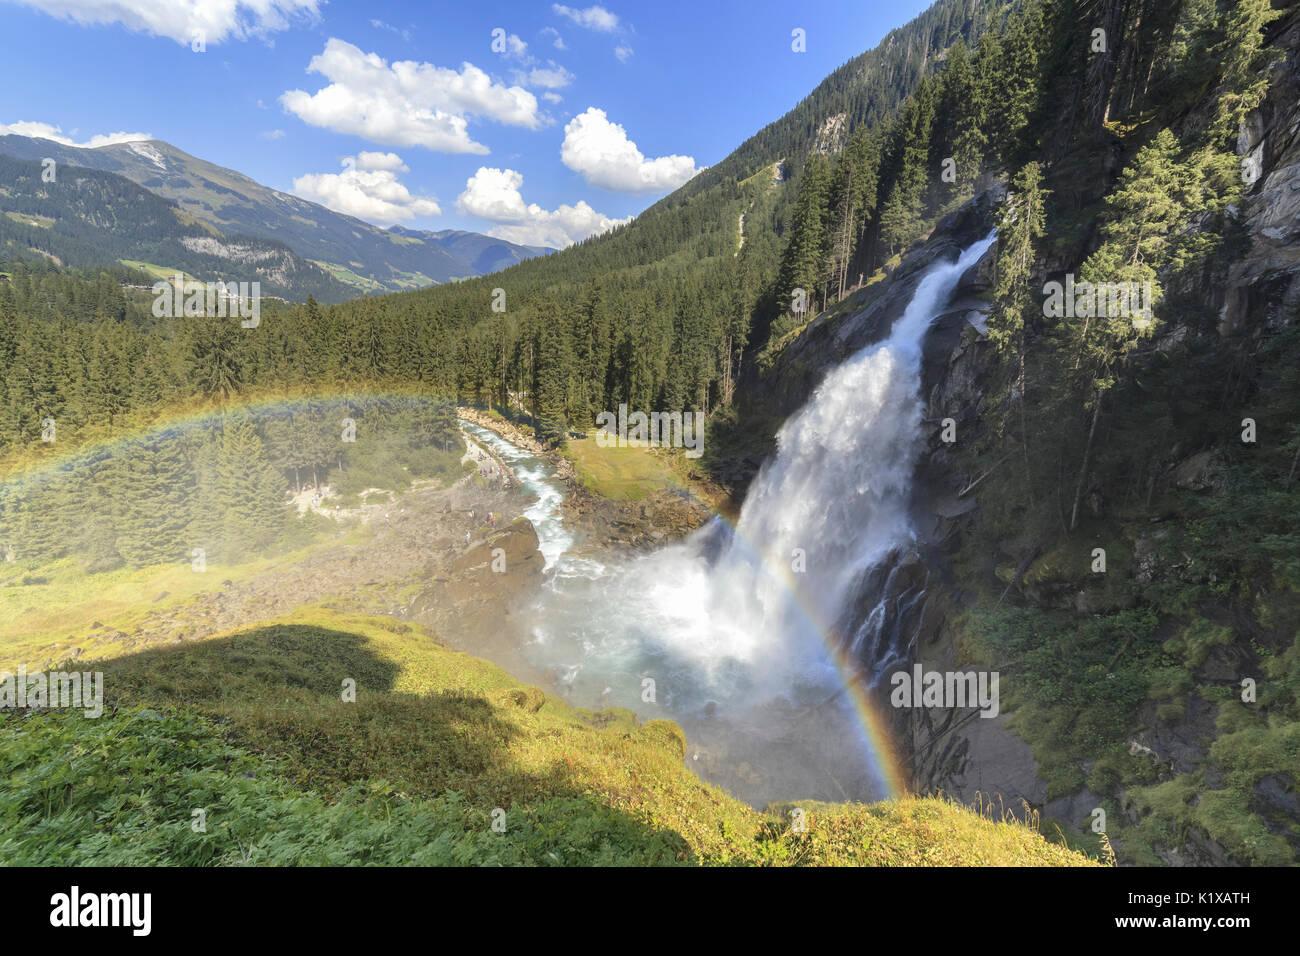 Europa, Austria, Salzburgo Tierra, Krimml, Parque Nacional Hohe Tauern, arco iris sobre las Cascadas Krimml Foto de stock